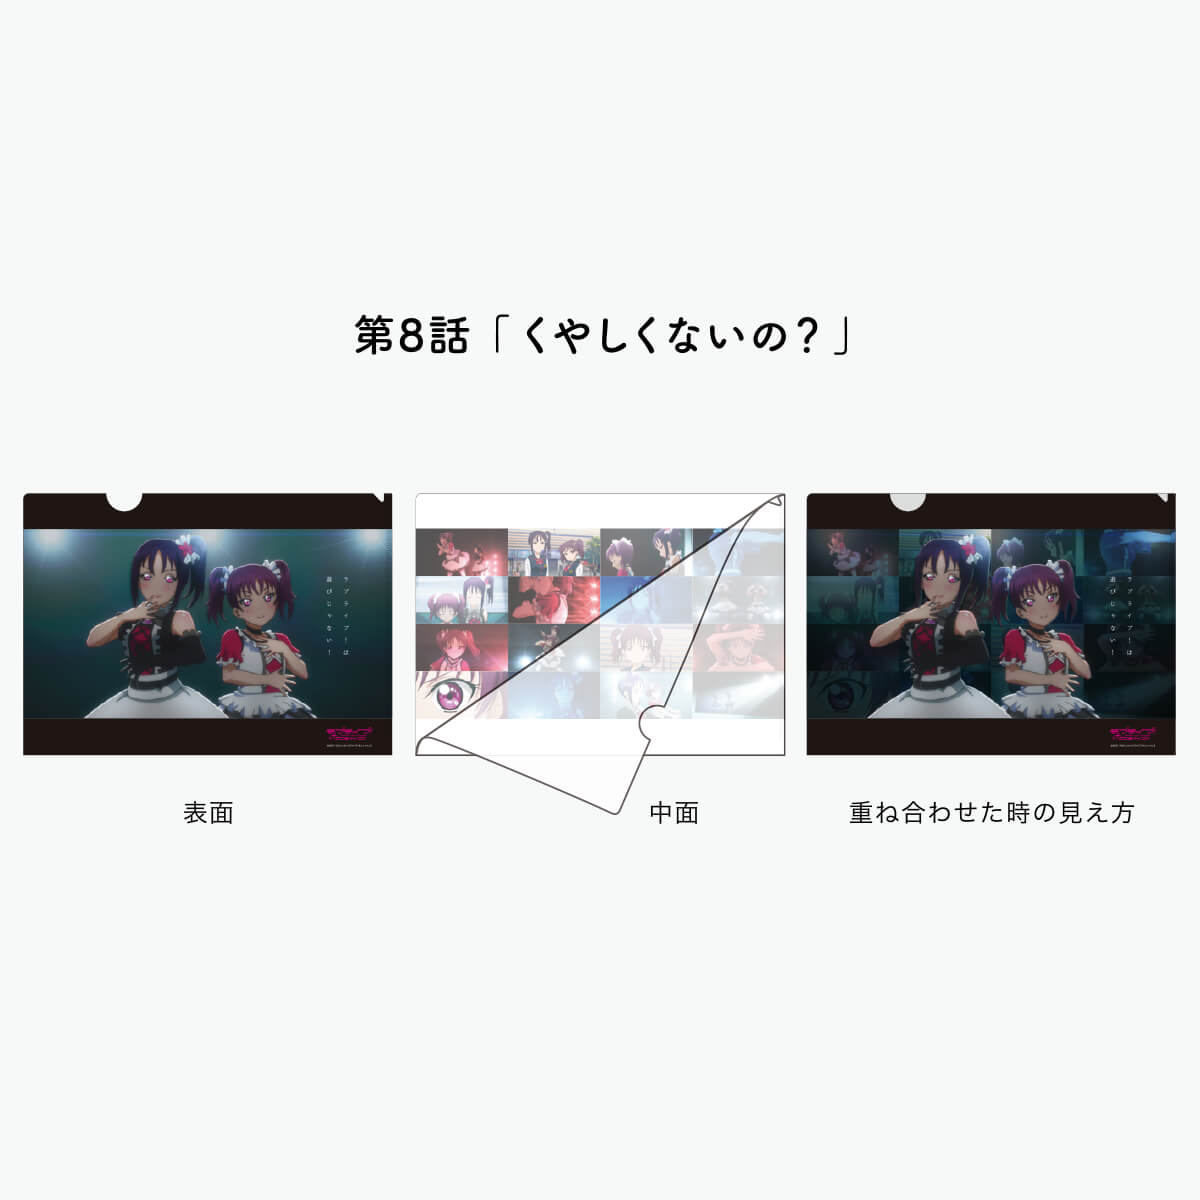 [REFRAIN SERIES]ラブライブ!サンシャイン!!TVシリーズ名場面クリアファイル第1弾 コンプリートセット 【全15種】